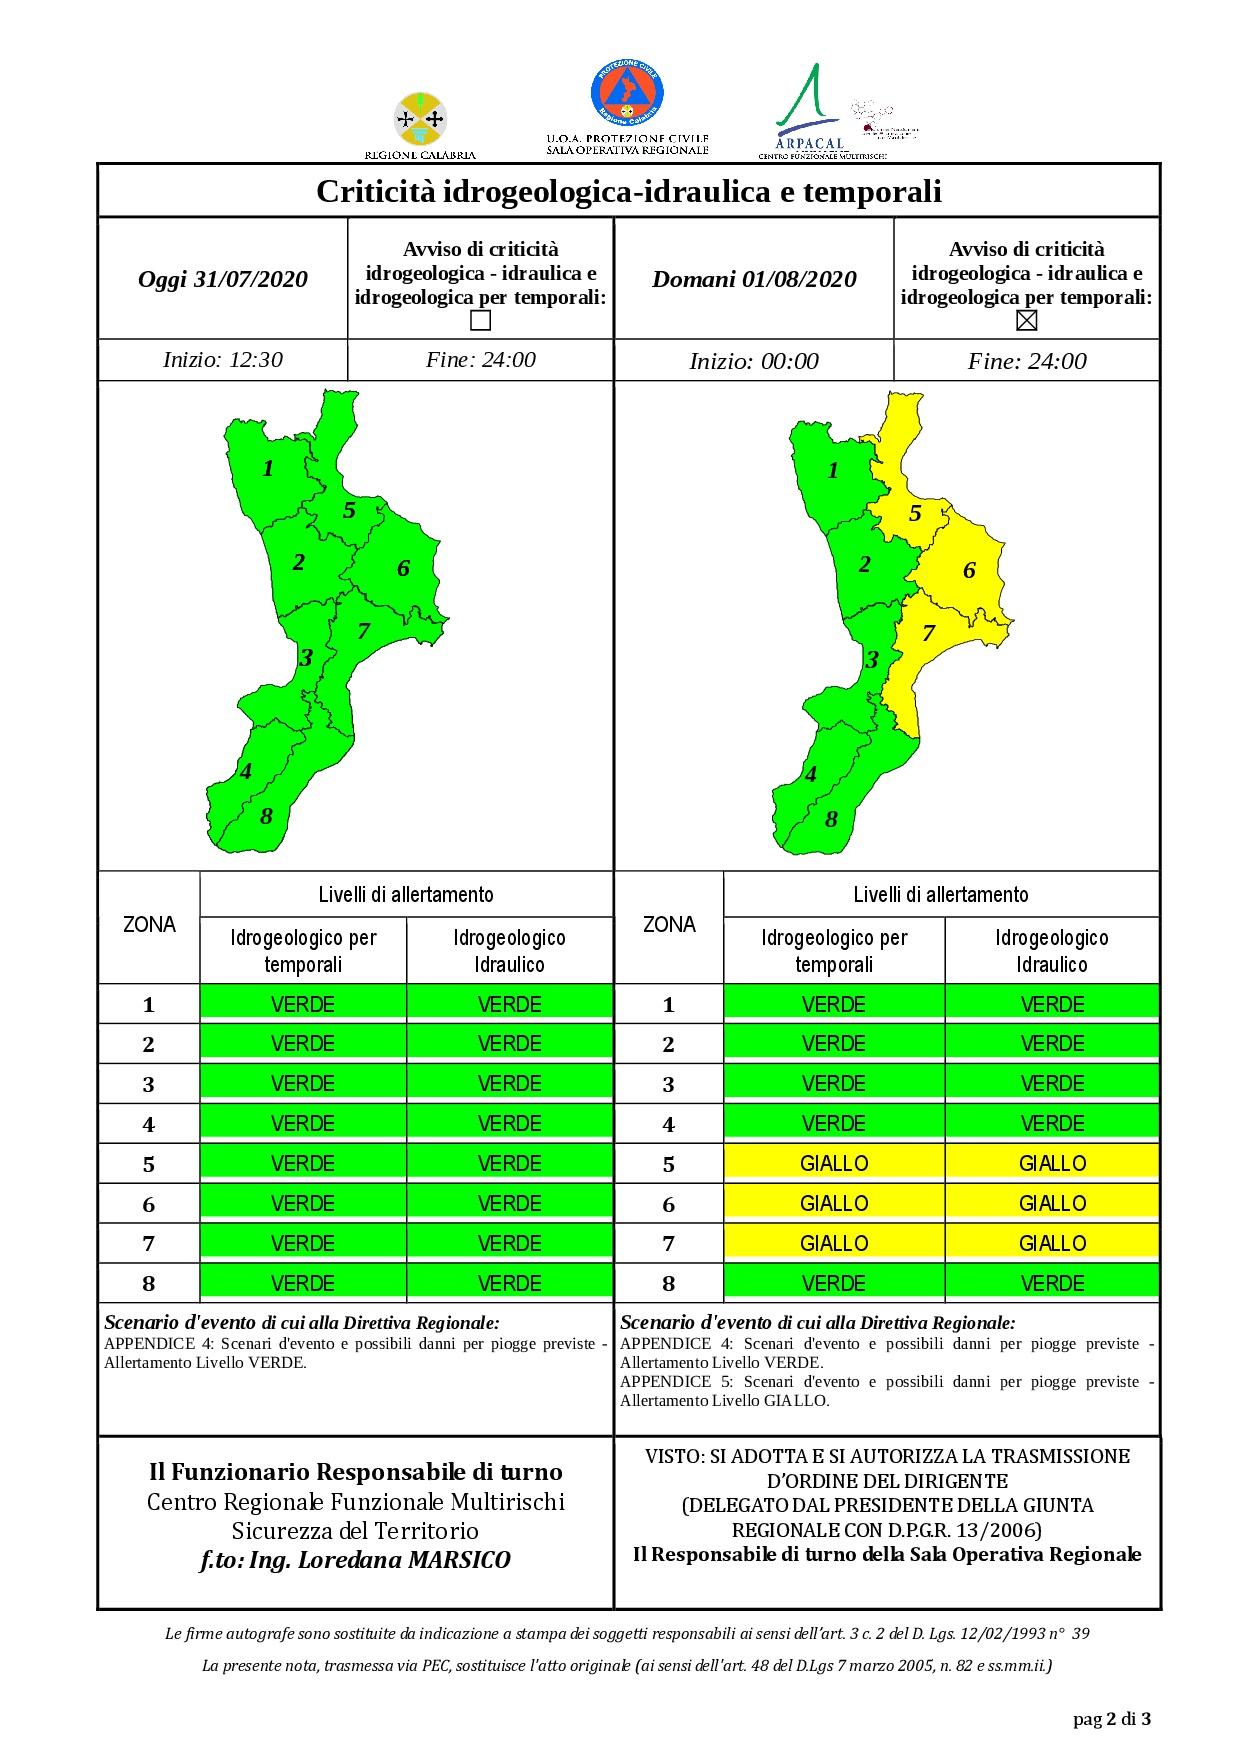 Criticità idrogeologica-idraulica e temporali in Calabria 31-07-2020